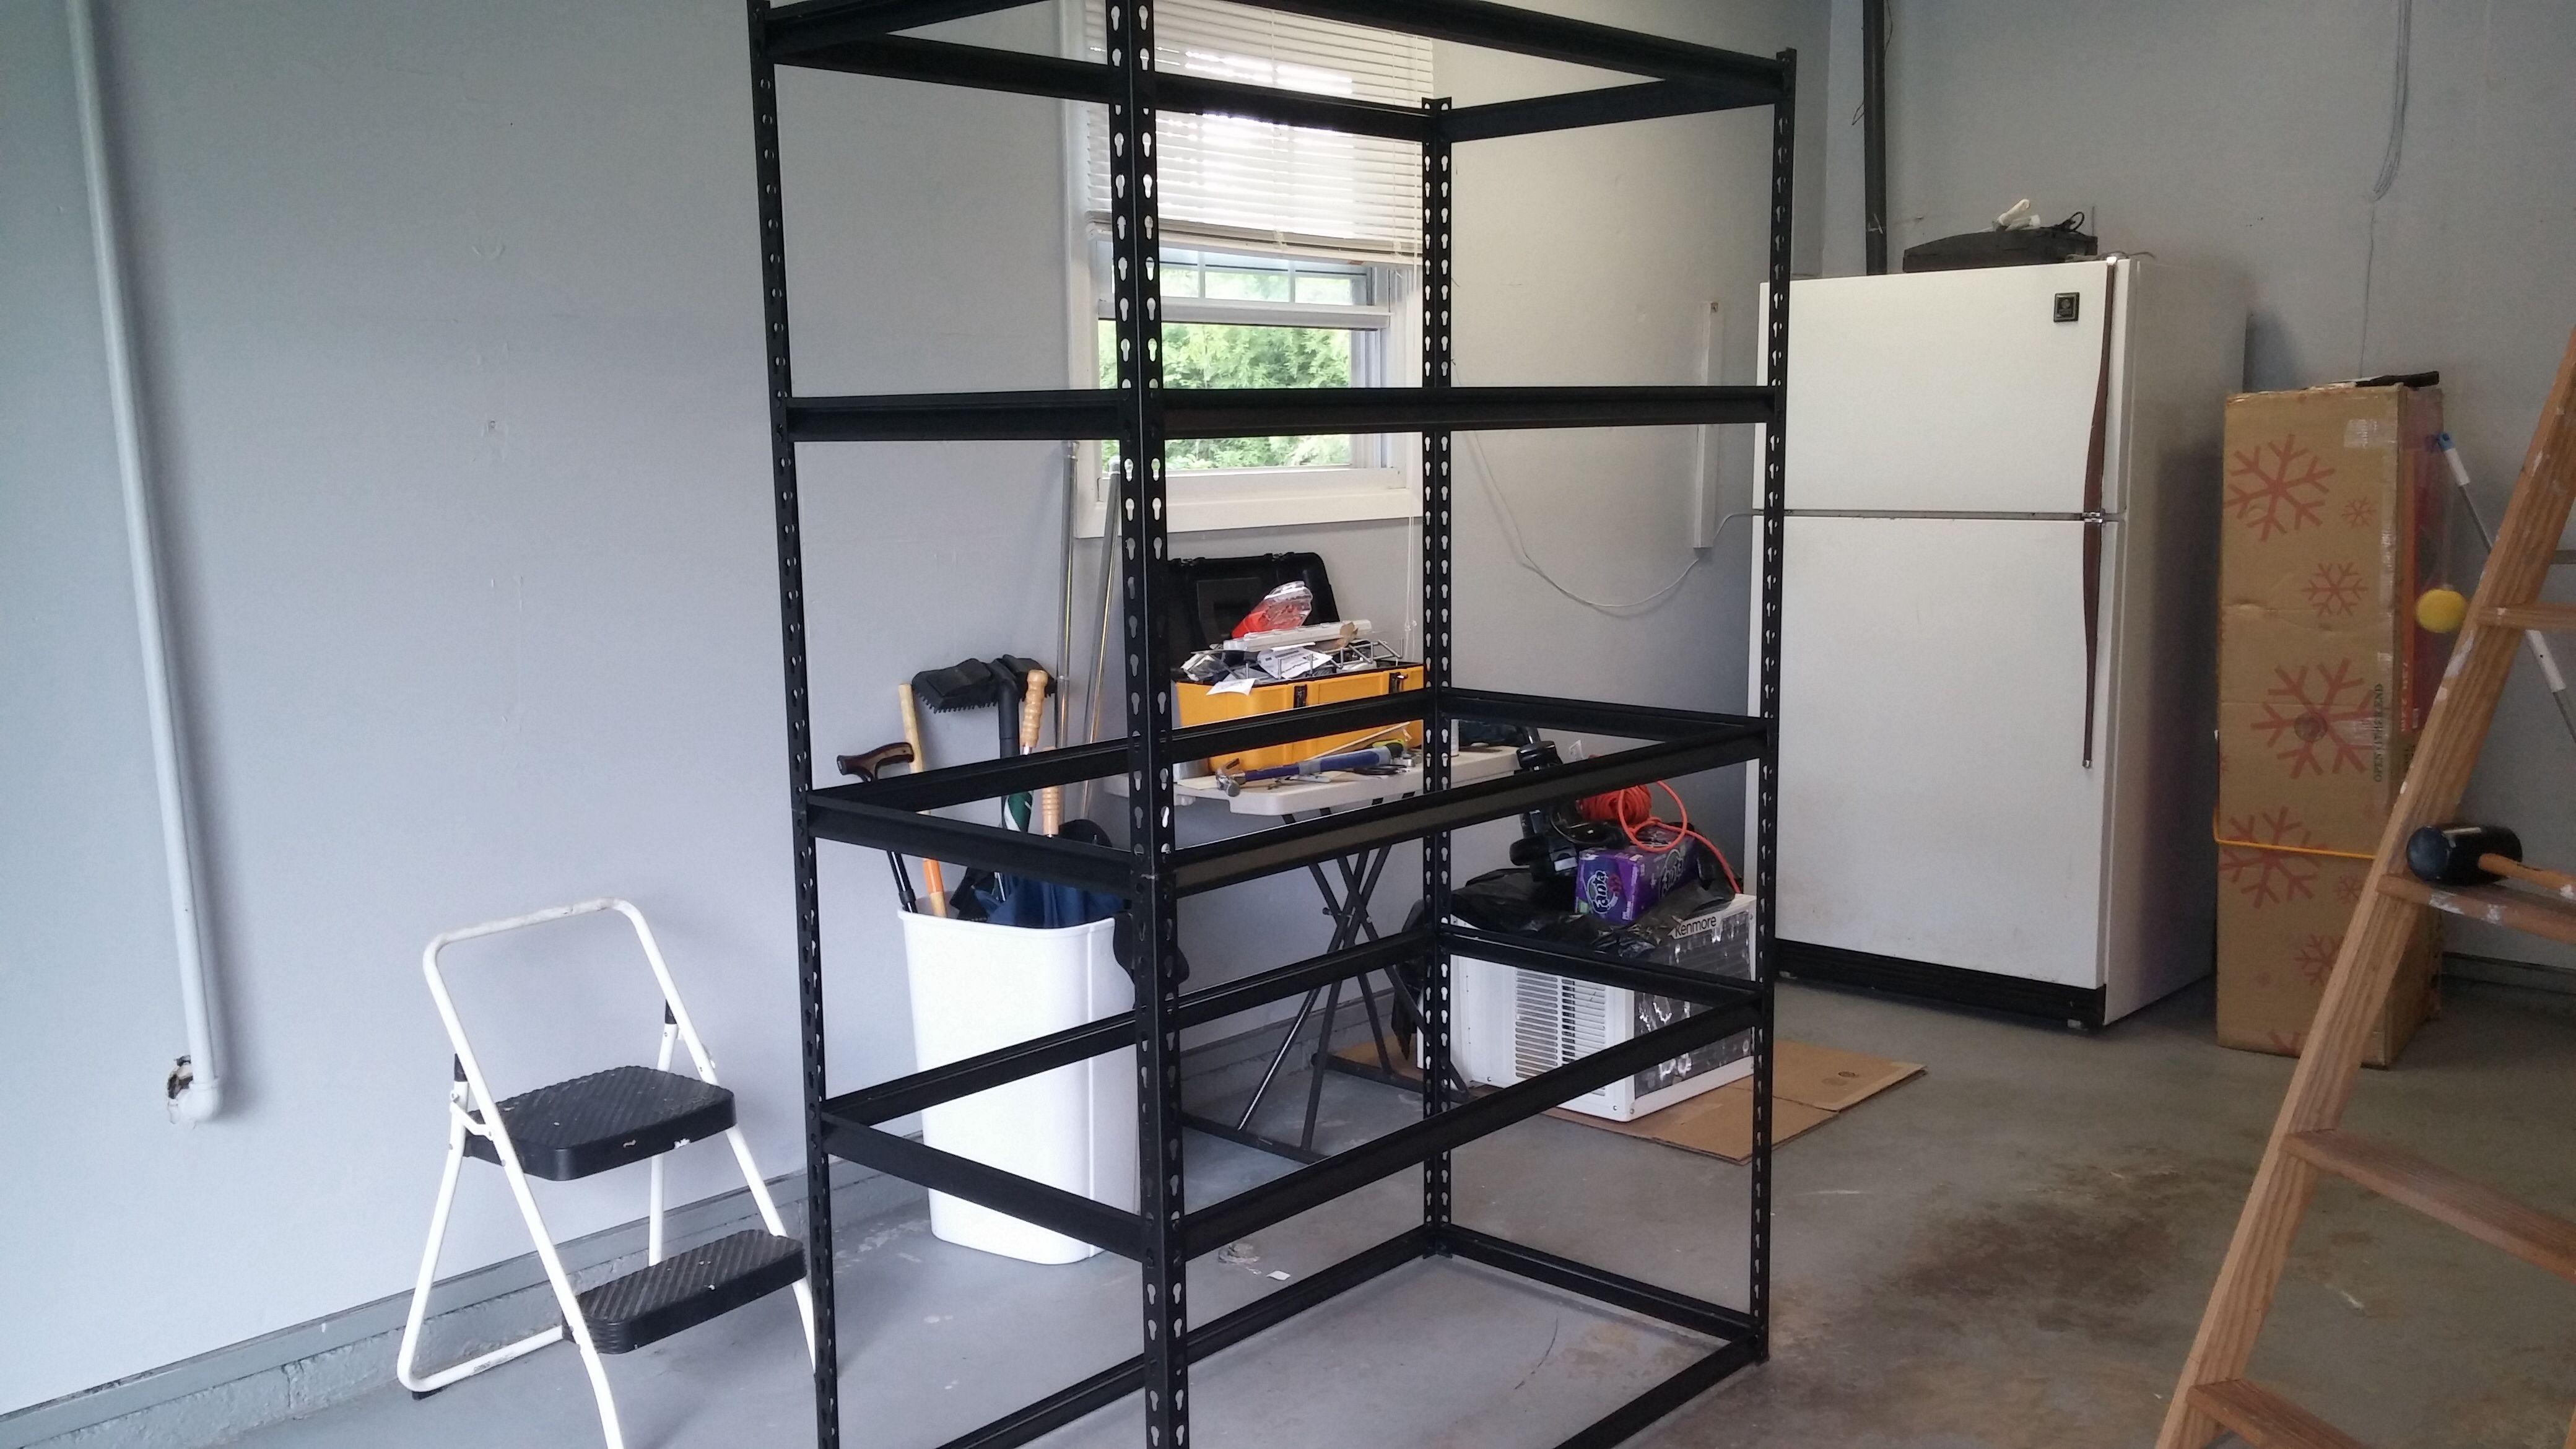 Gorilla Shelves From Home Depot